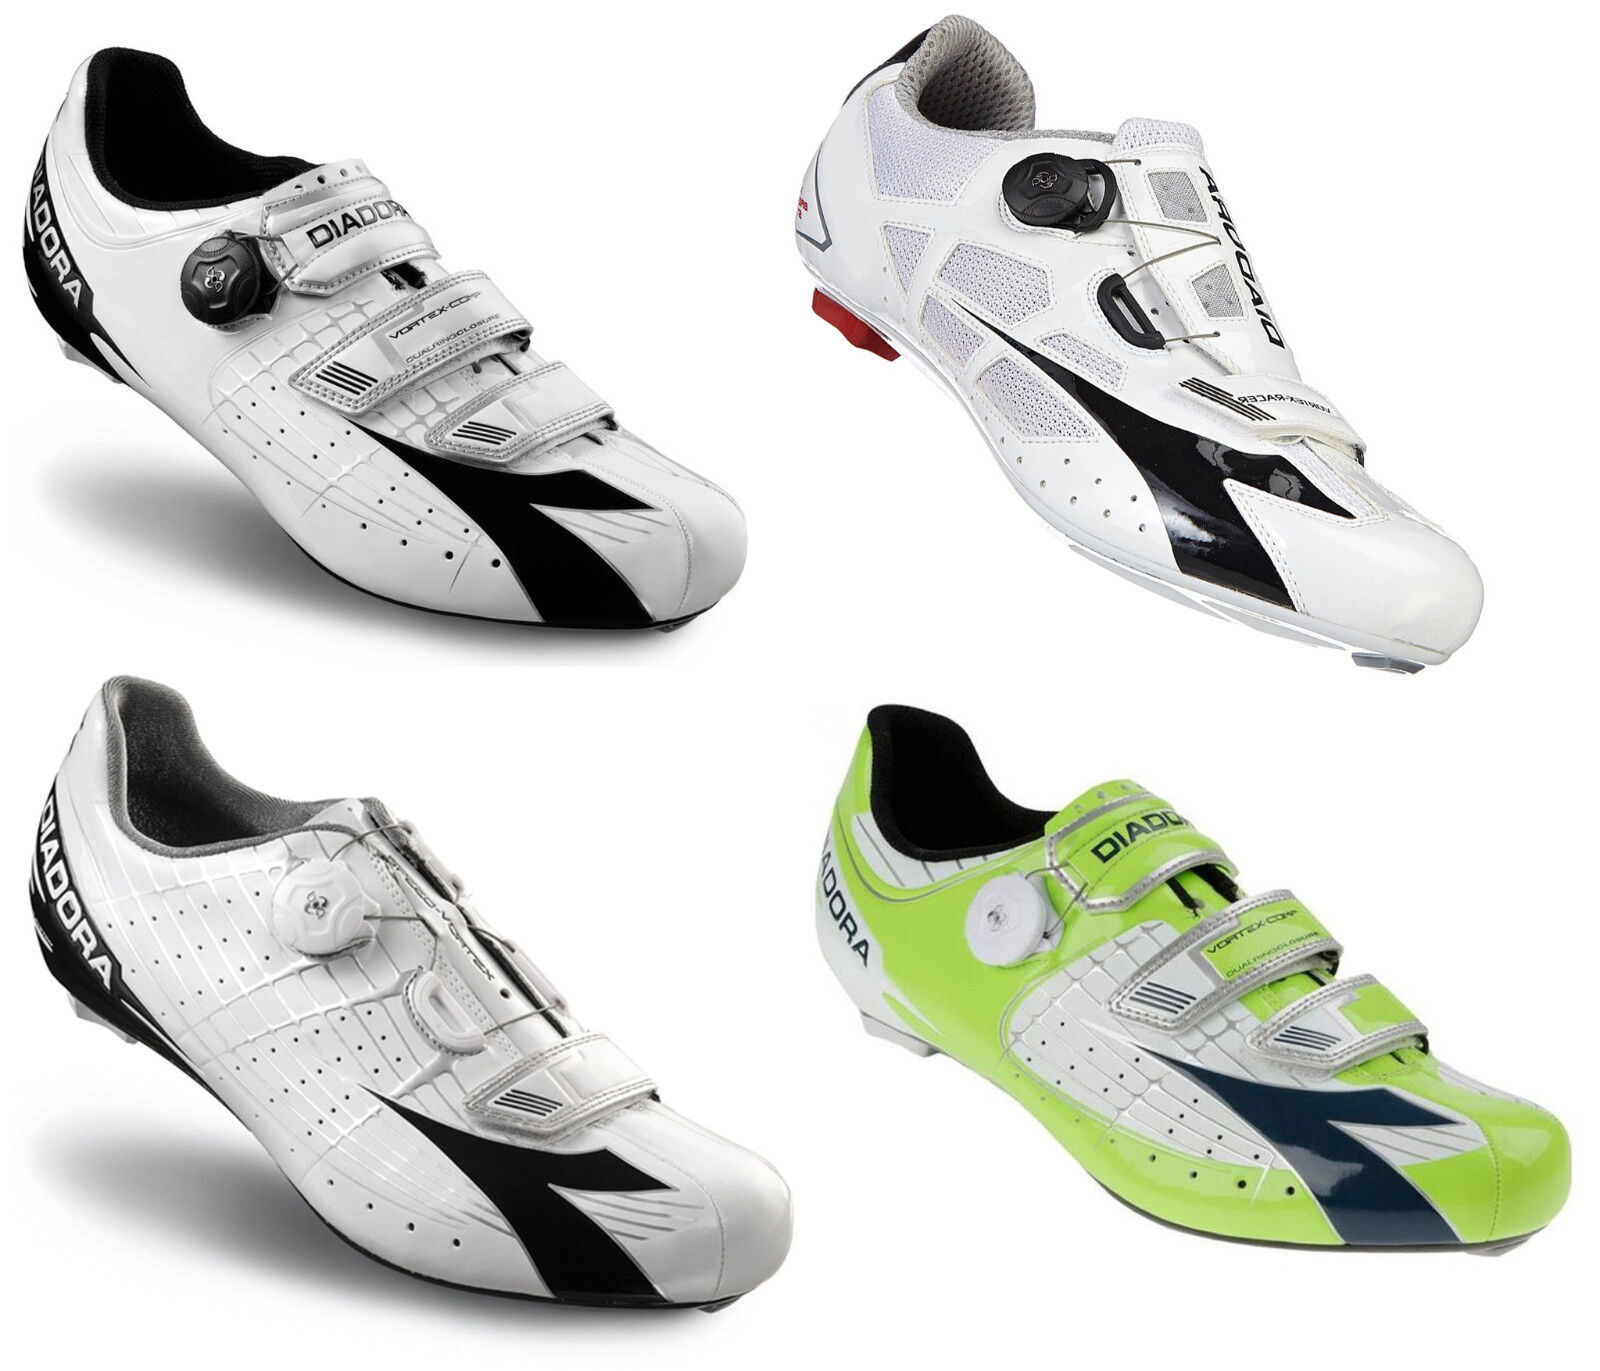 DIADORA Road Vortex COMP Speed Racer Fahrradschuhe MTB Gr. 41-46 Rennrad Schuhe